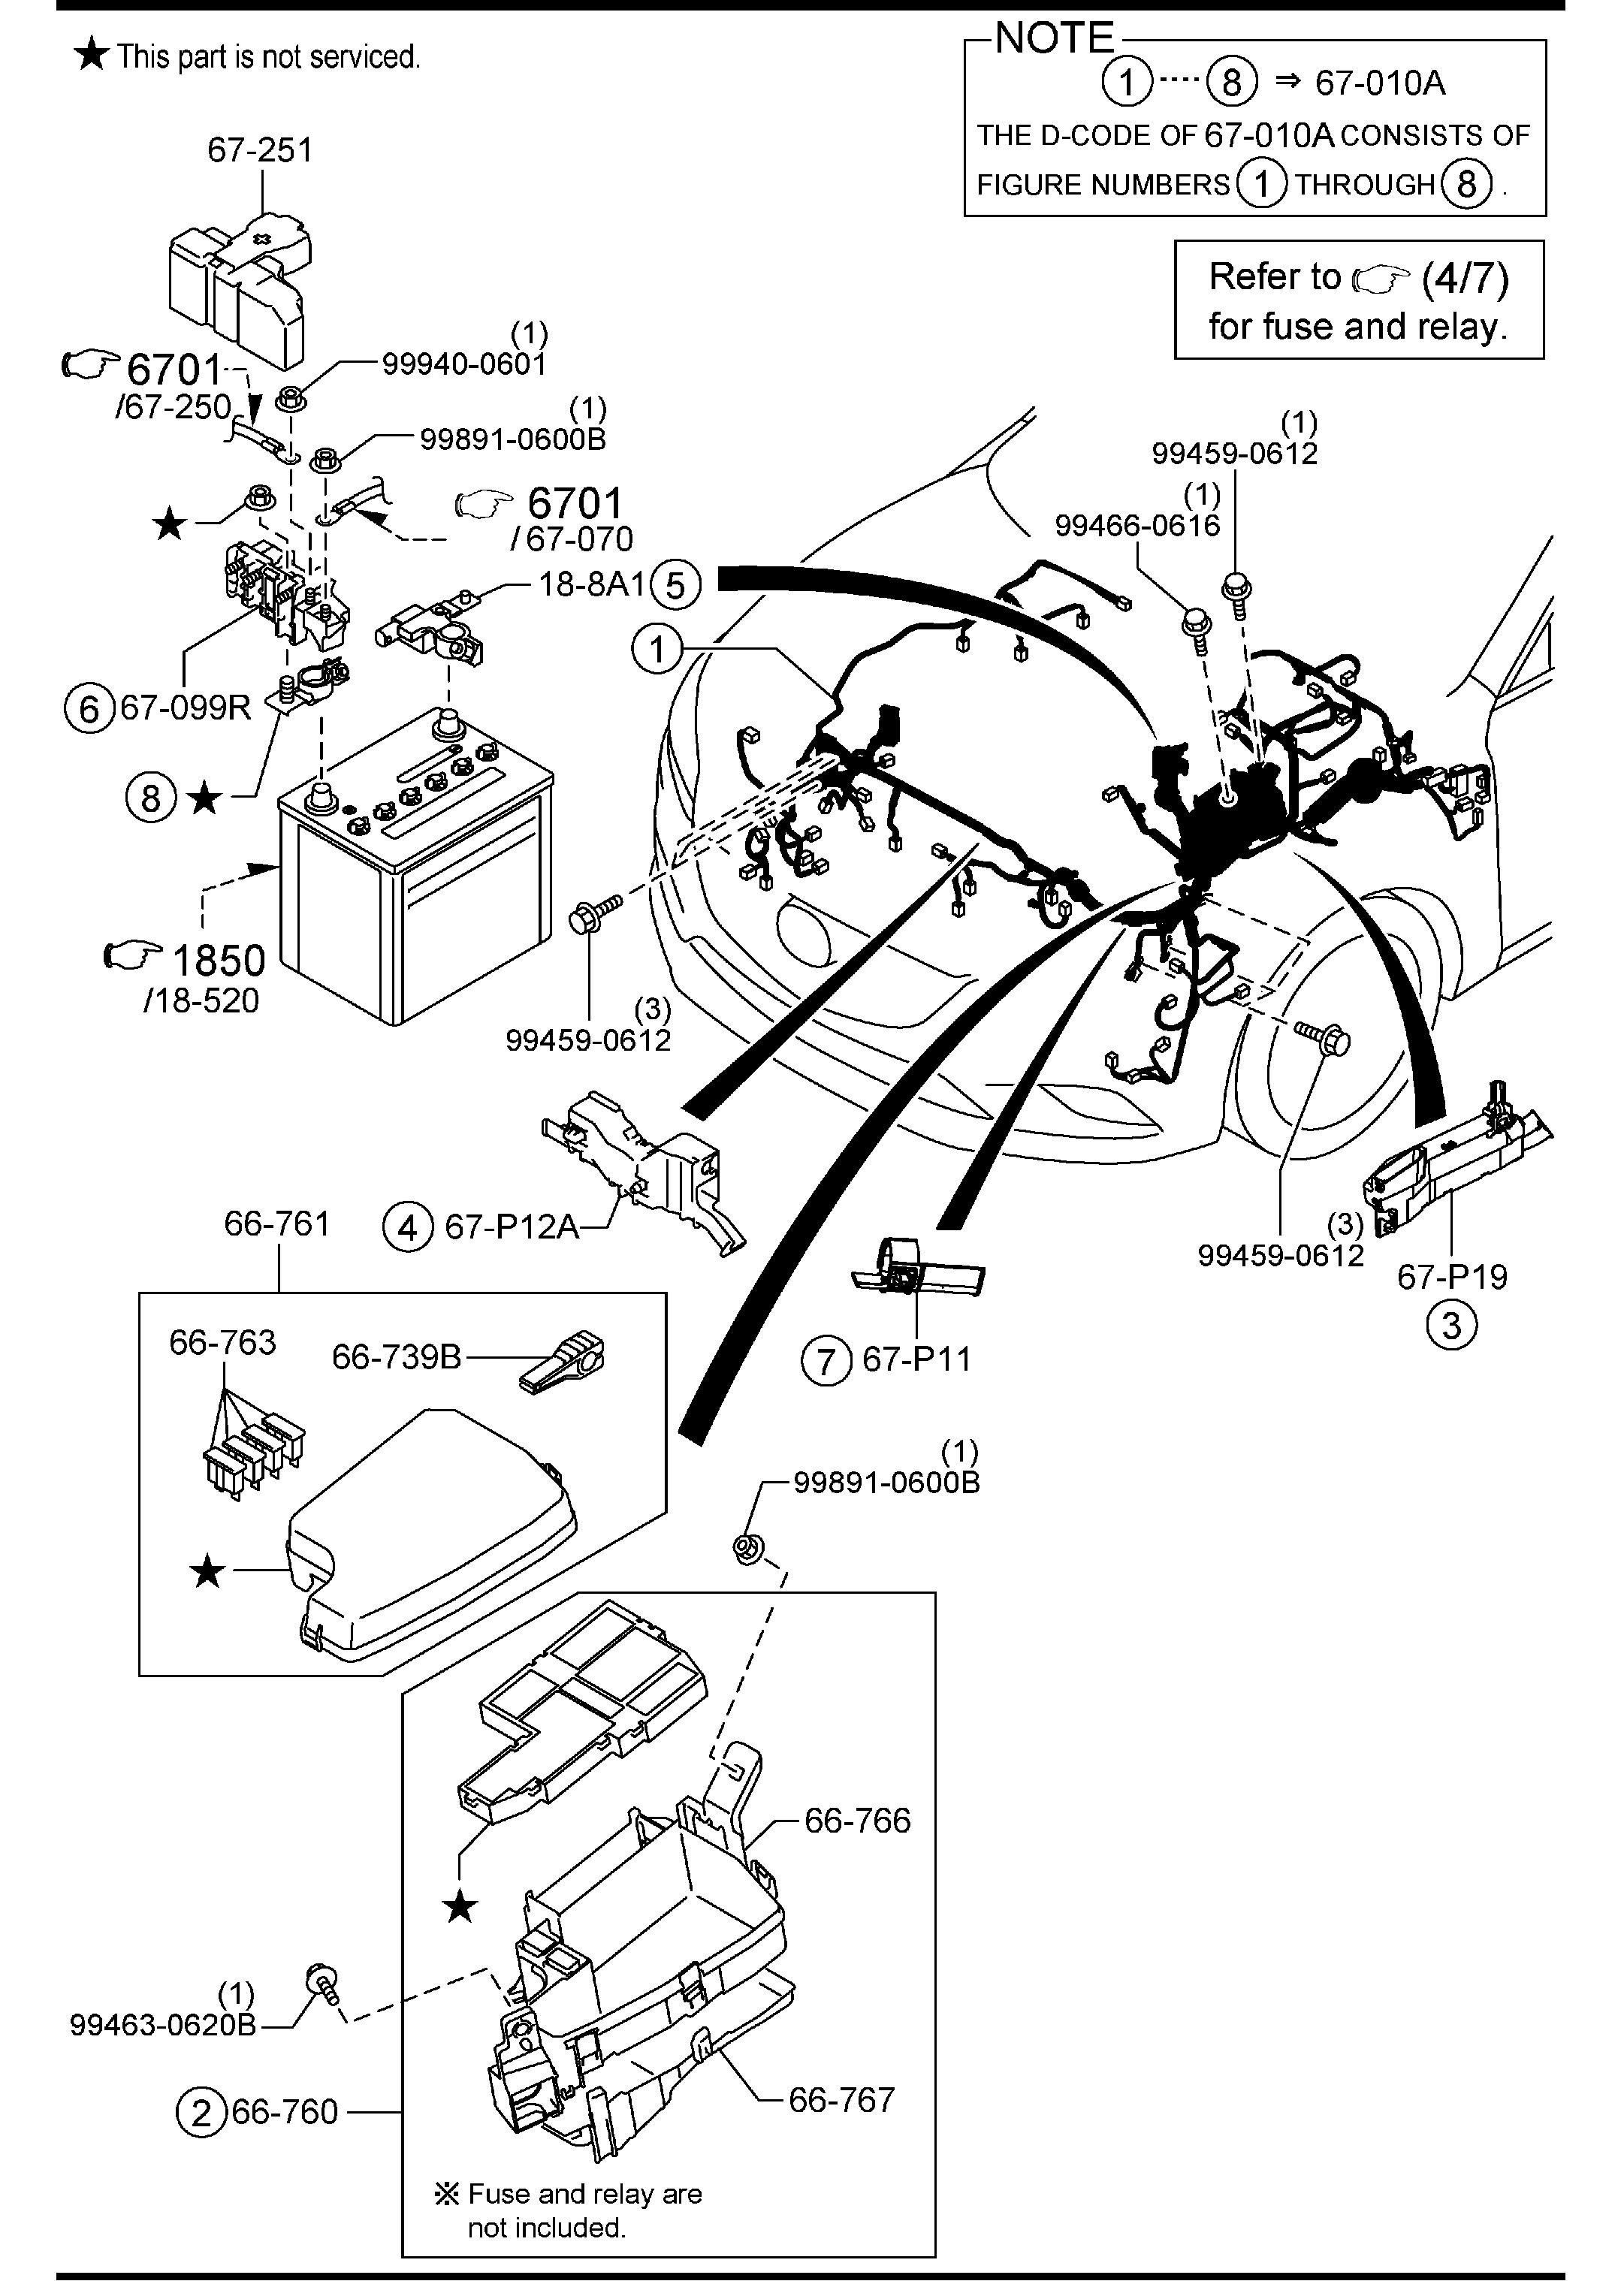 Service manual [1994 Mazda Mx 3 Digram For A Rear Floor